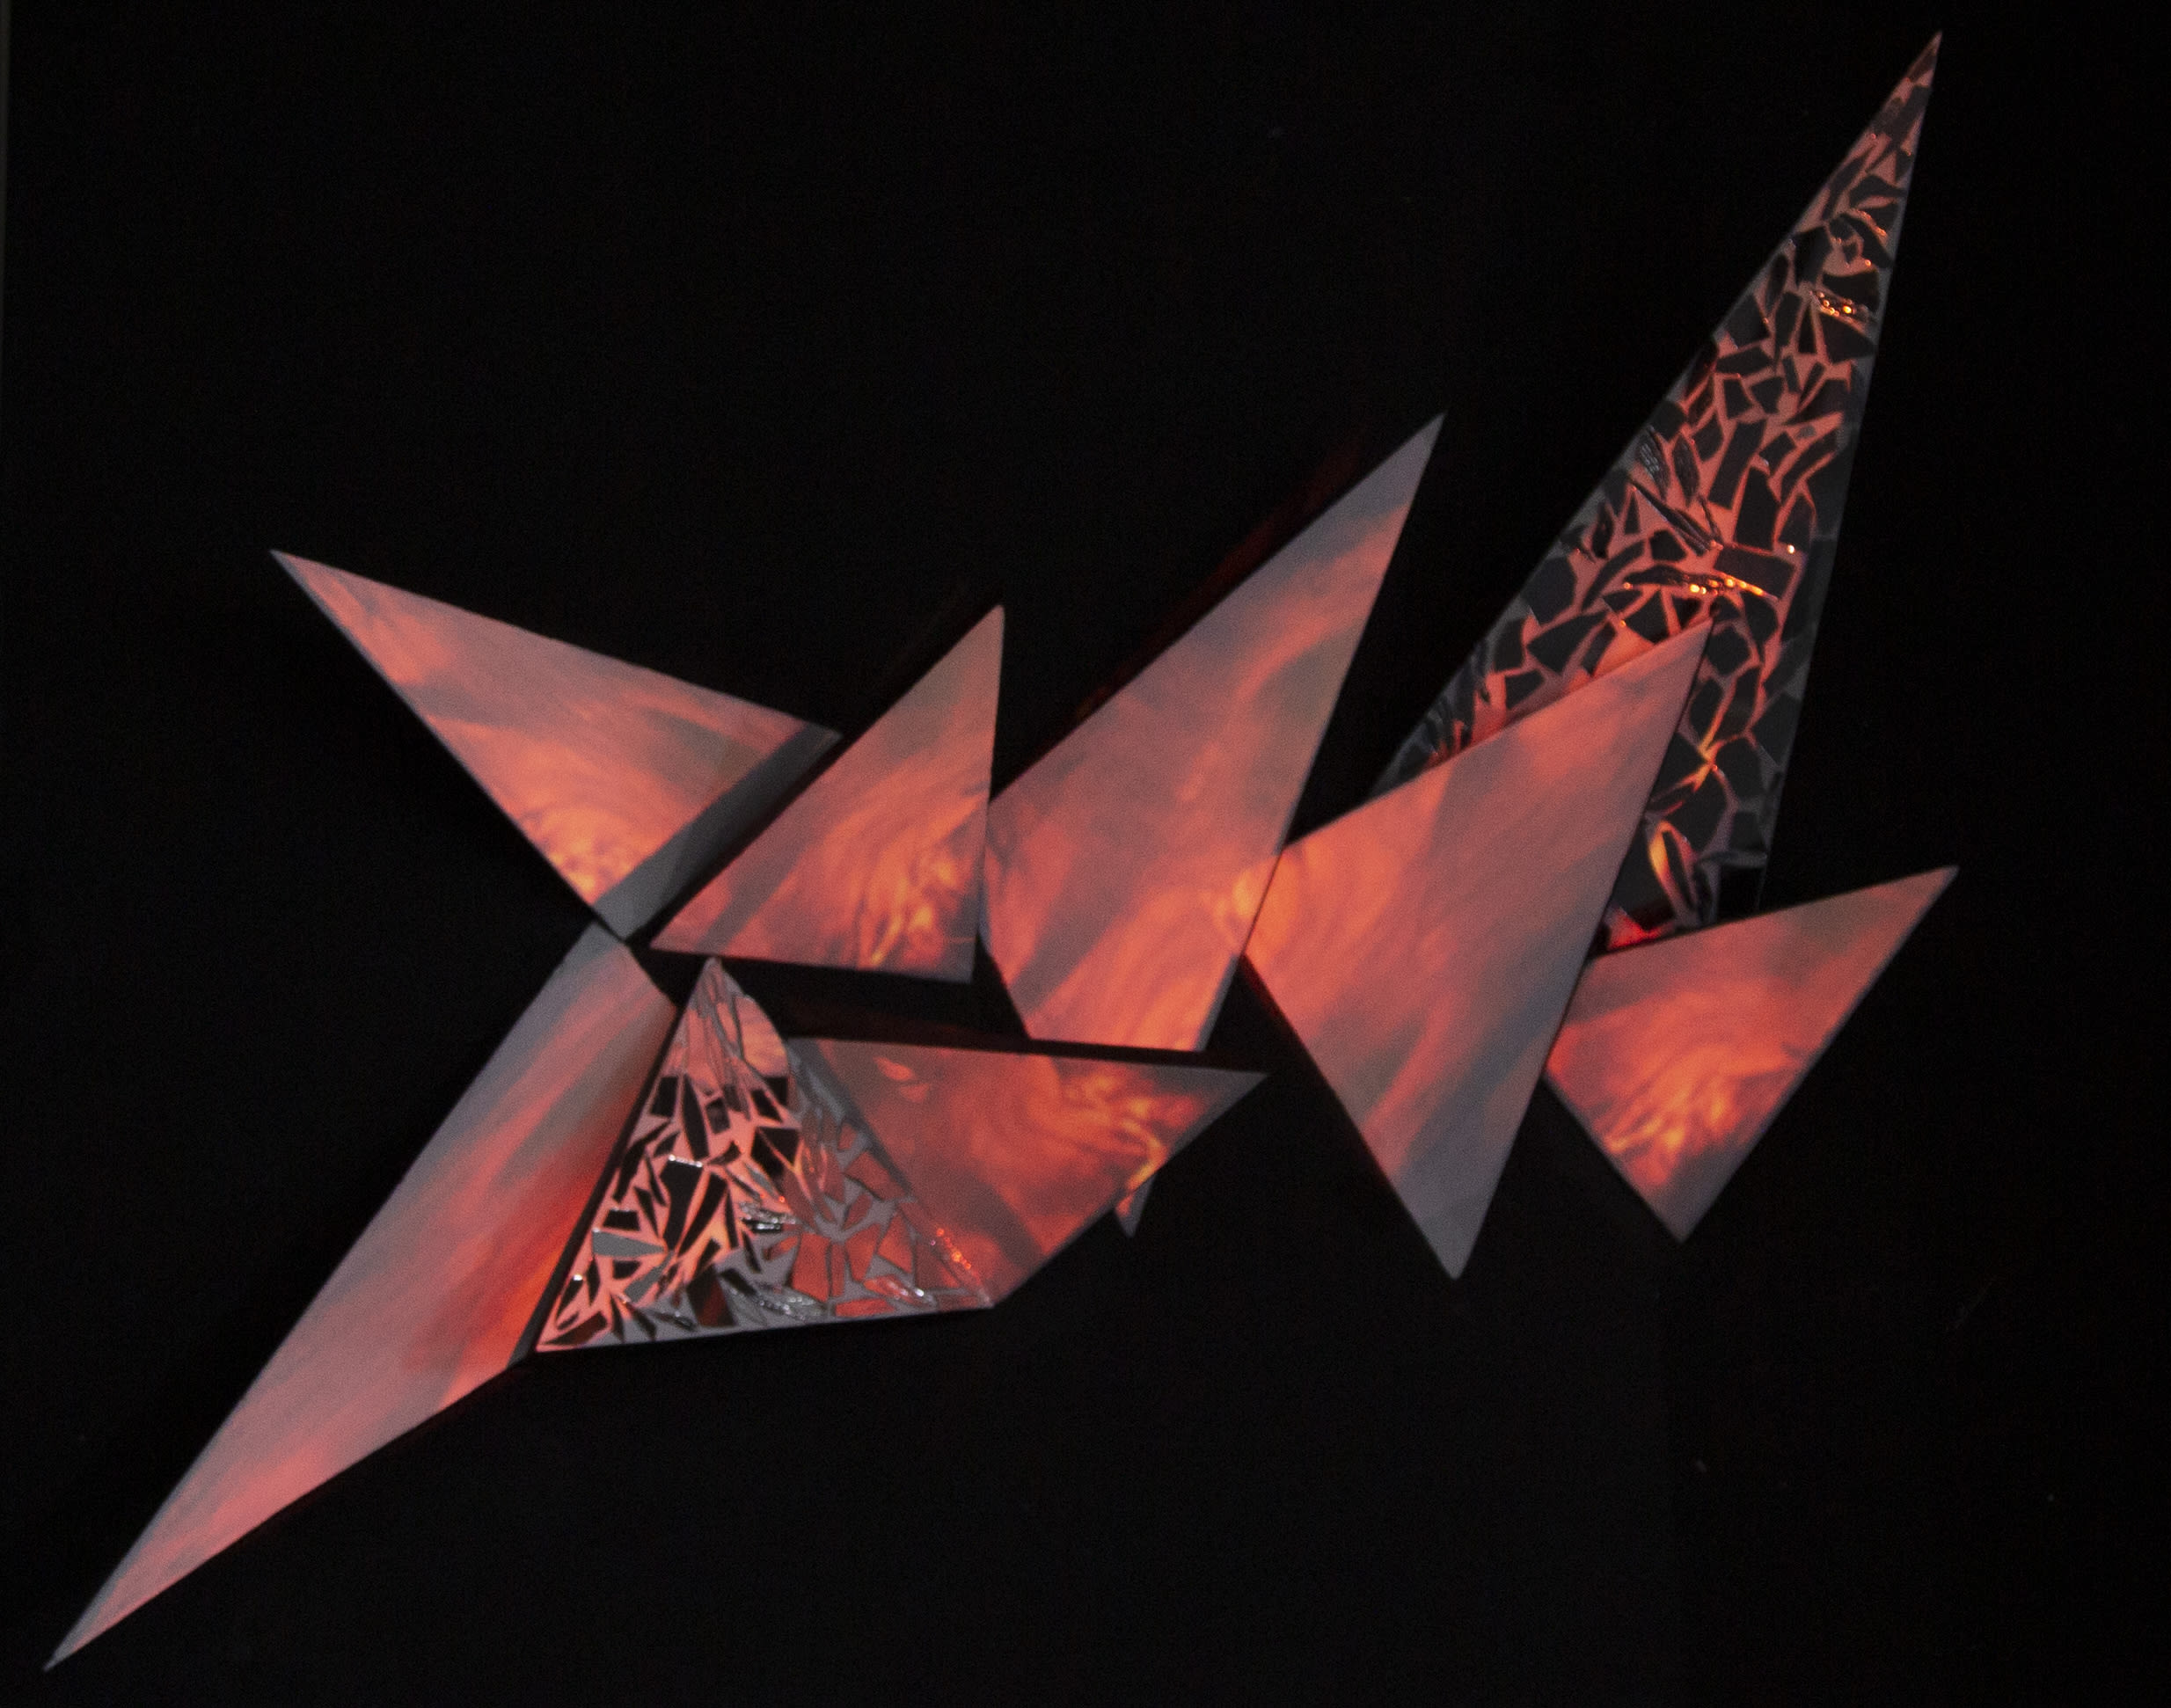 Raisha-Hussain,-Kimberly-Duya,-Katarina-Gomnaes,-James-Marfell-3D-installation.jpg